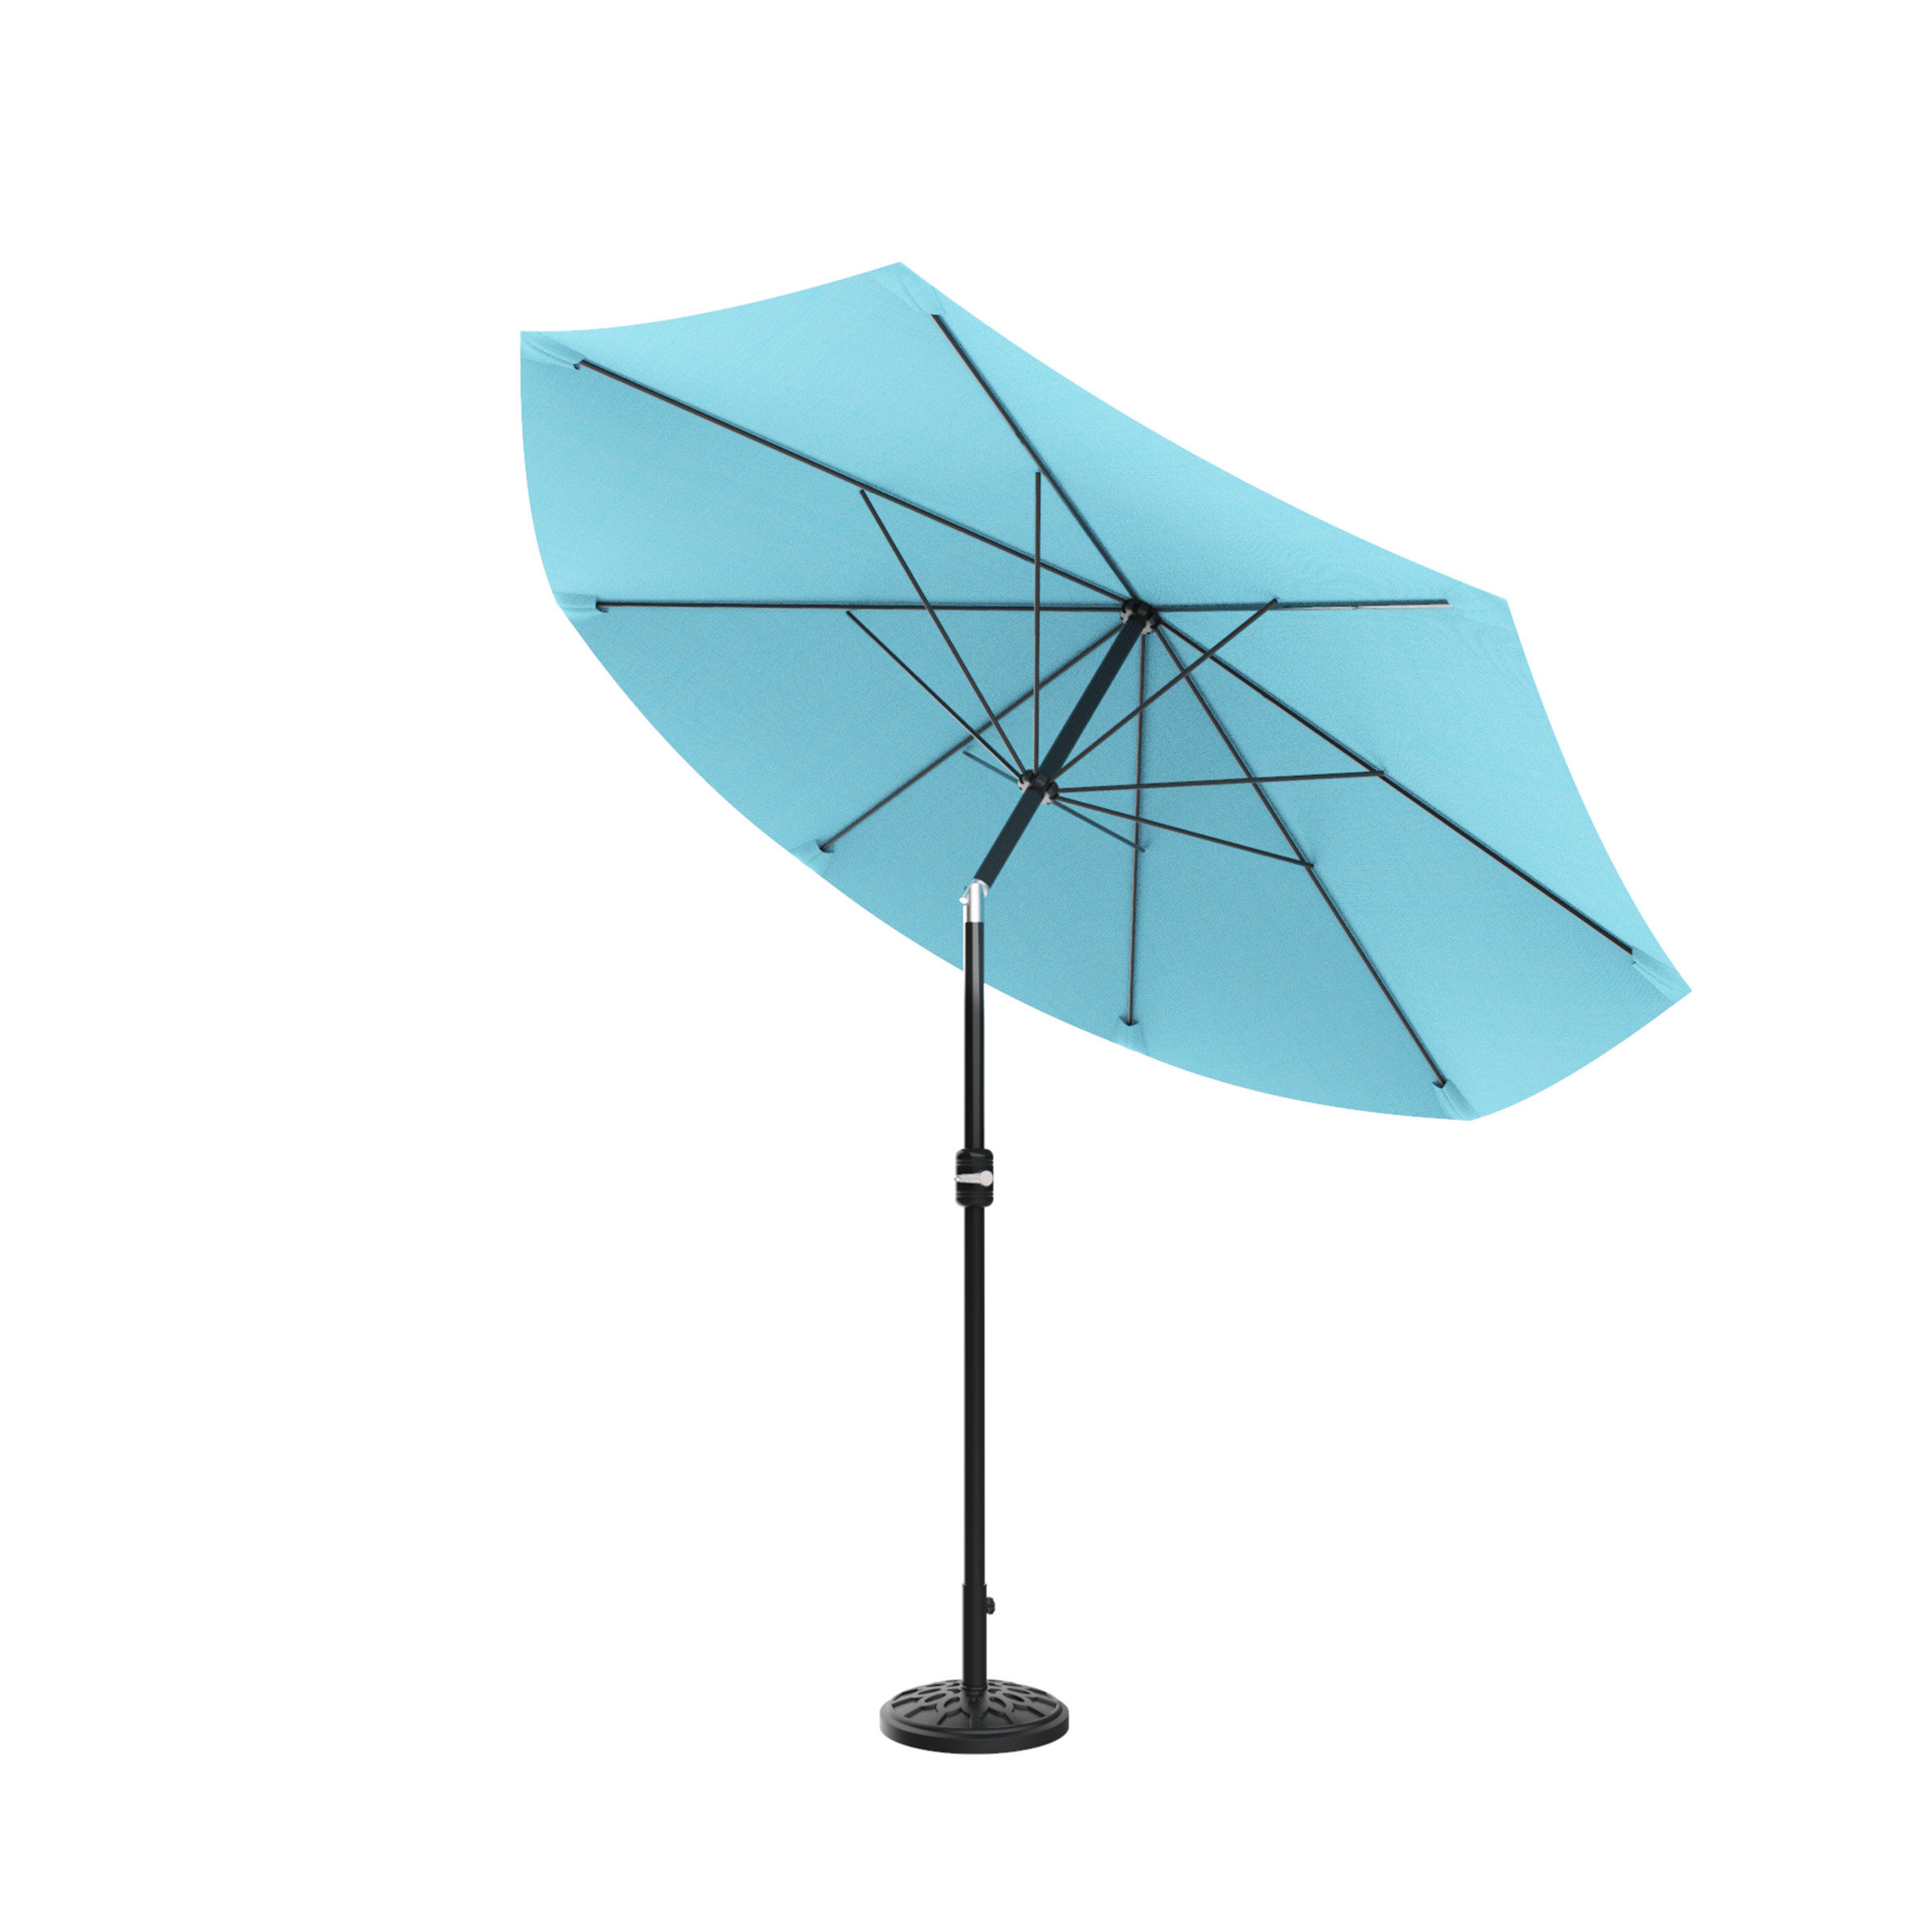 Widely Used Delaplaine Market Umbrellas Within Kelton 10' Market Umbrella (View 9 of 20)